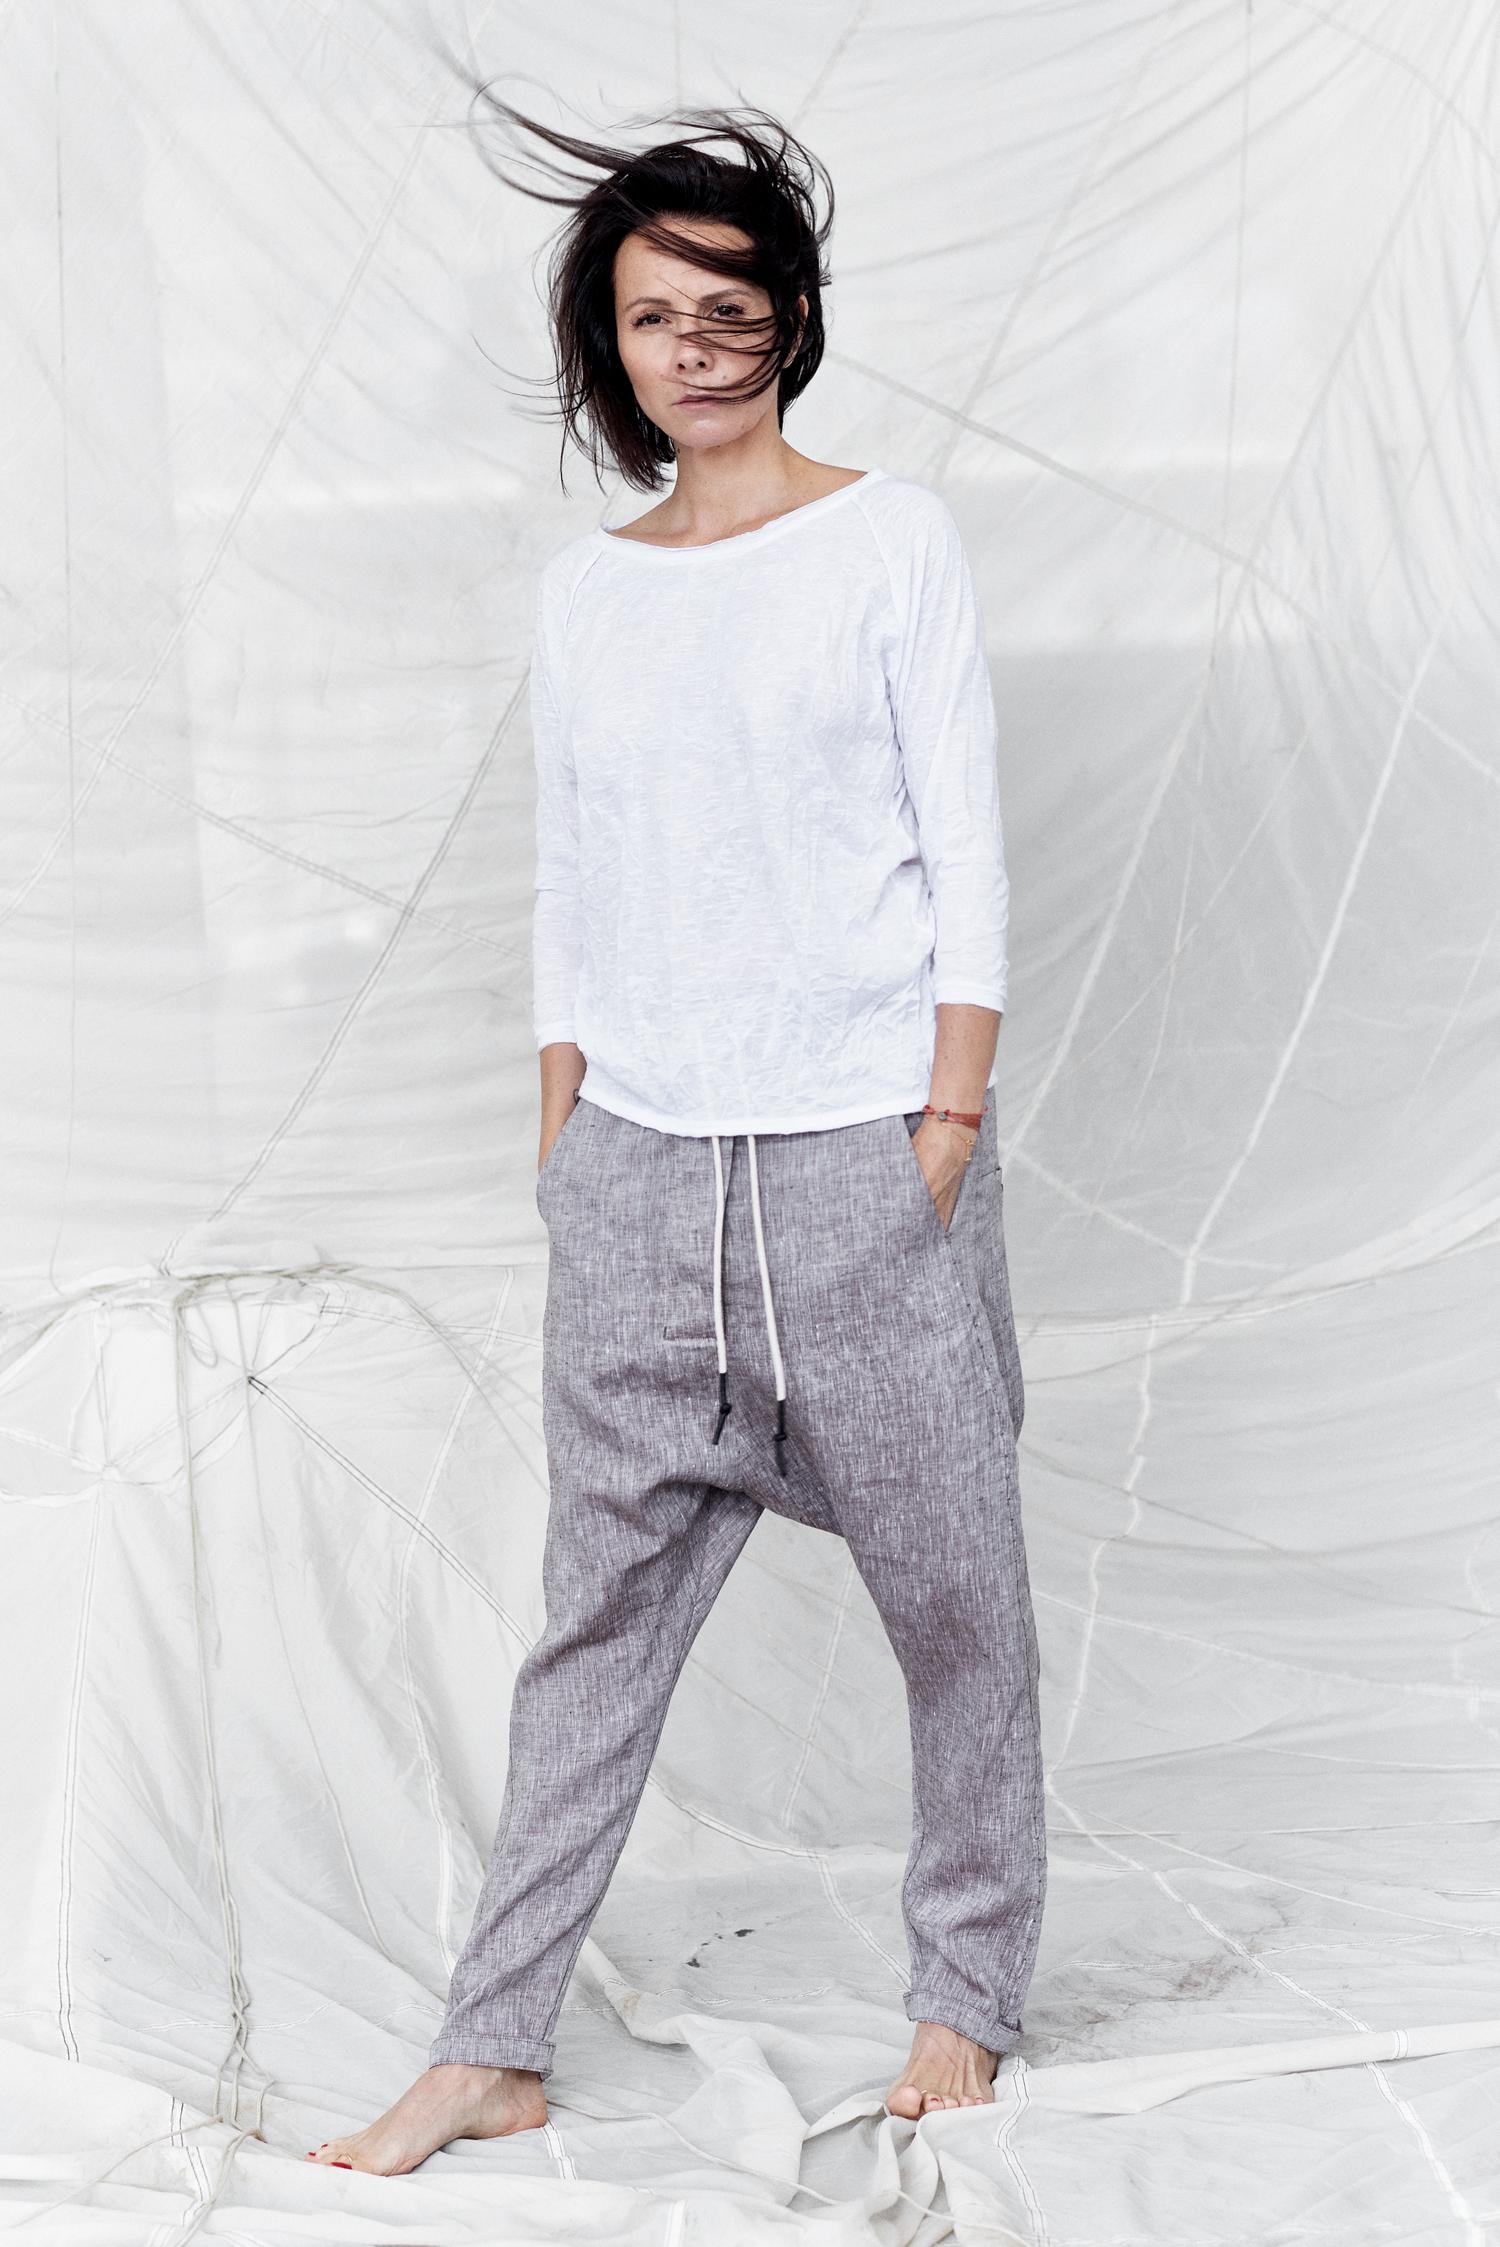 GREY linen pantsgrey drop crotch pantgslinen drop crotch pantswoman linen pants